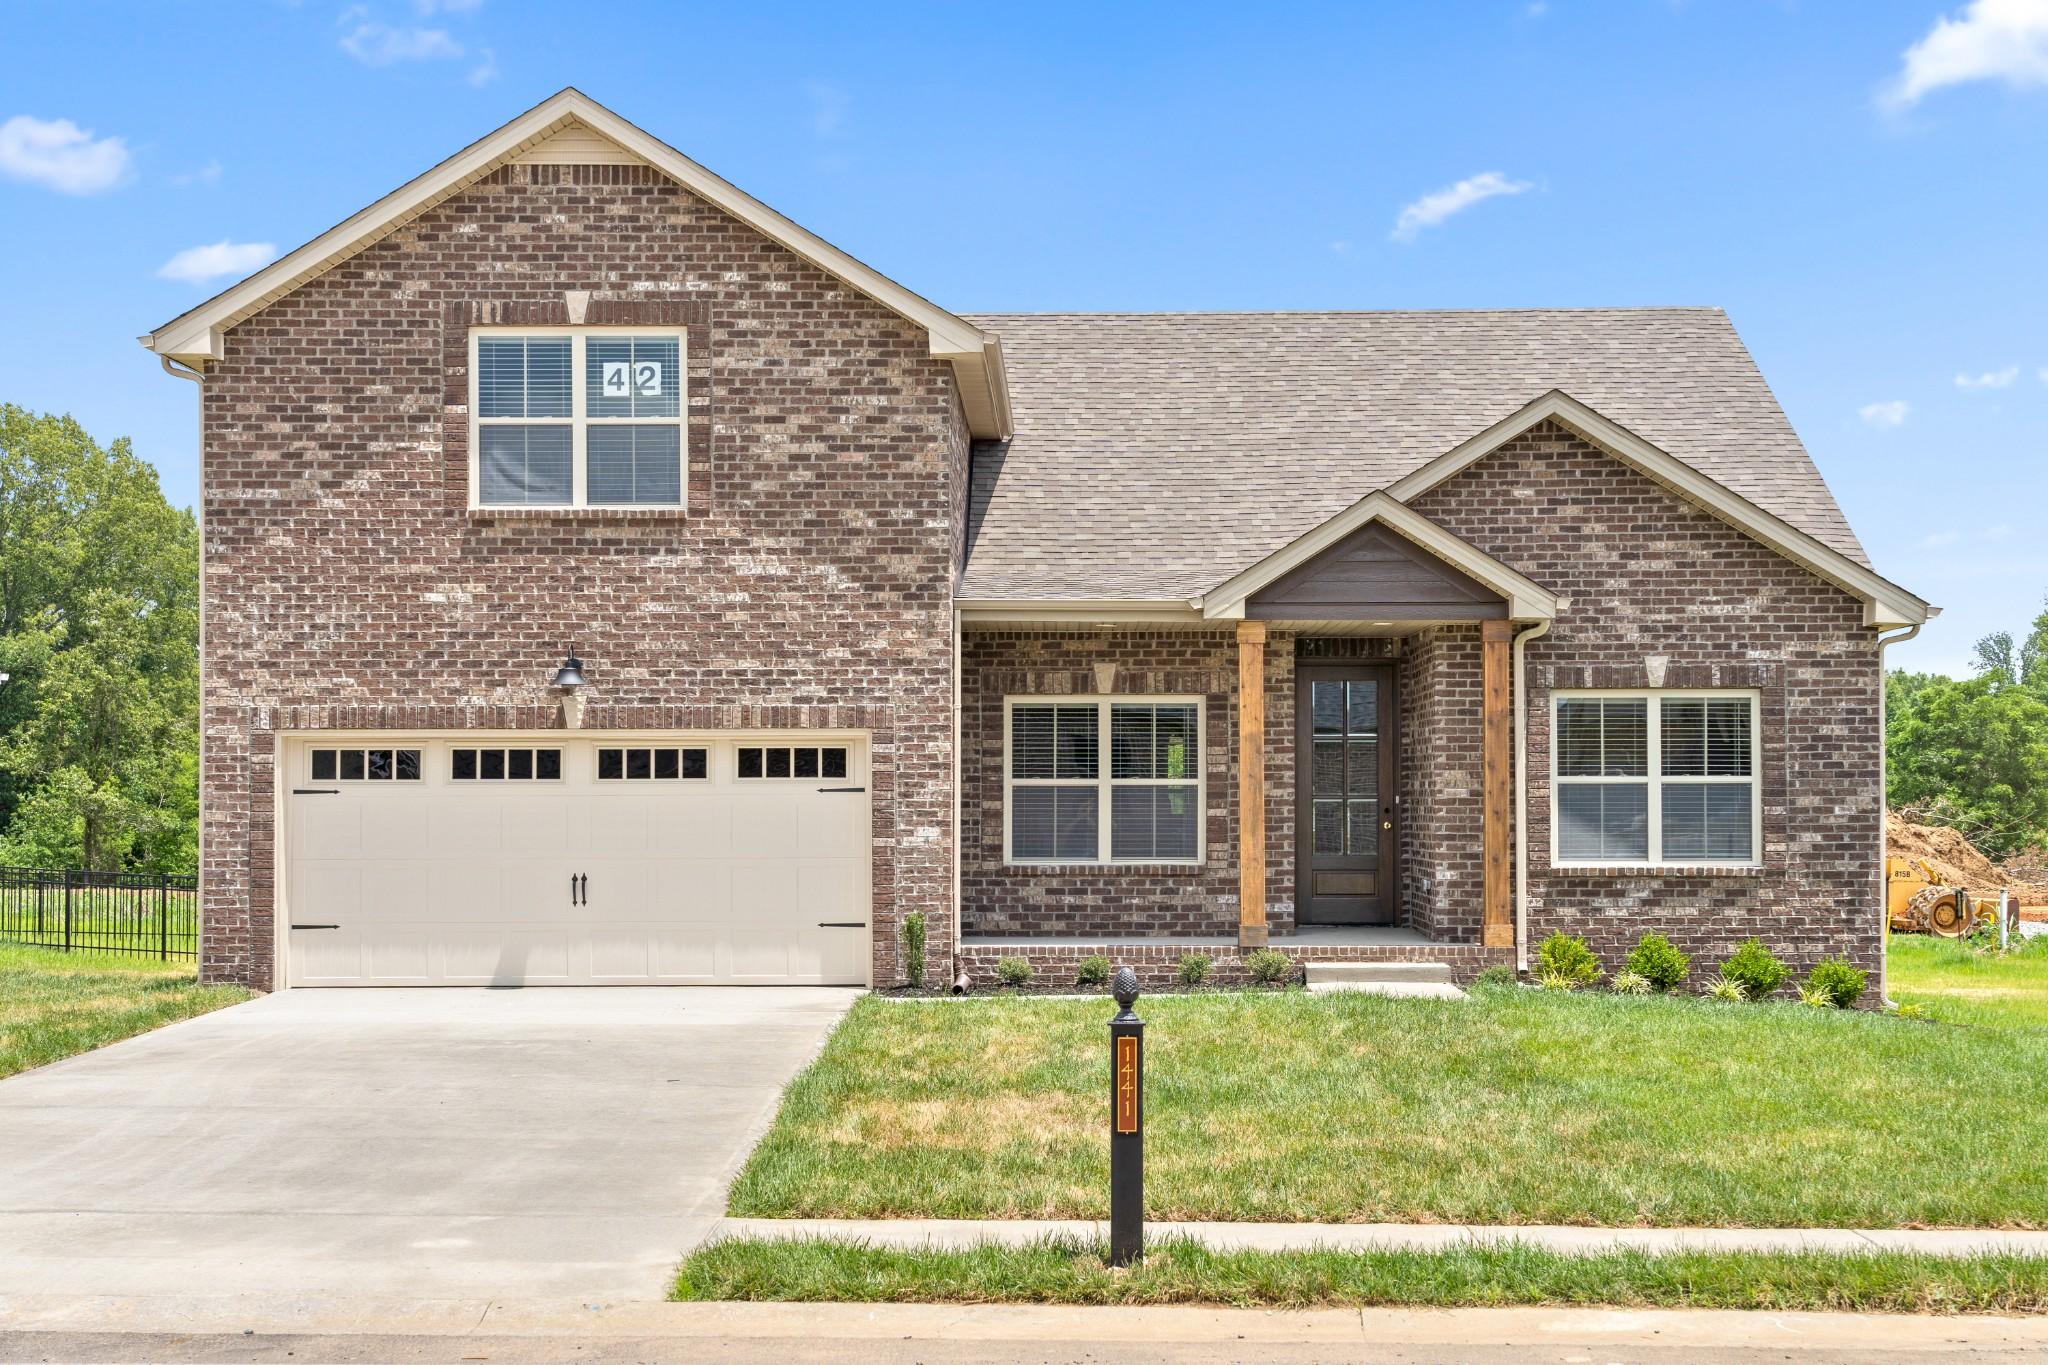 1441 Hereford Blvd. Lot 42, Clarksville, TN 37043 - Clarksville, TN real estate listing